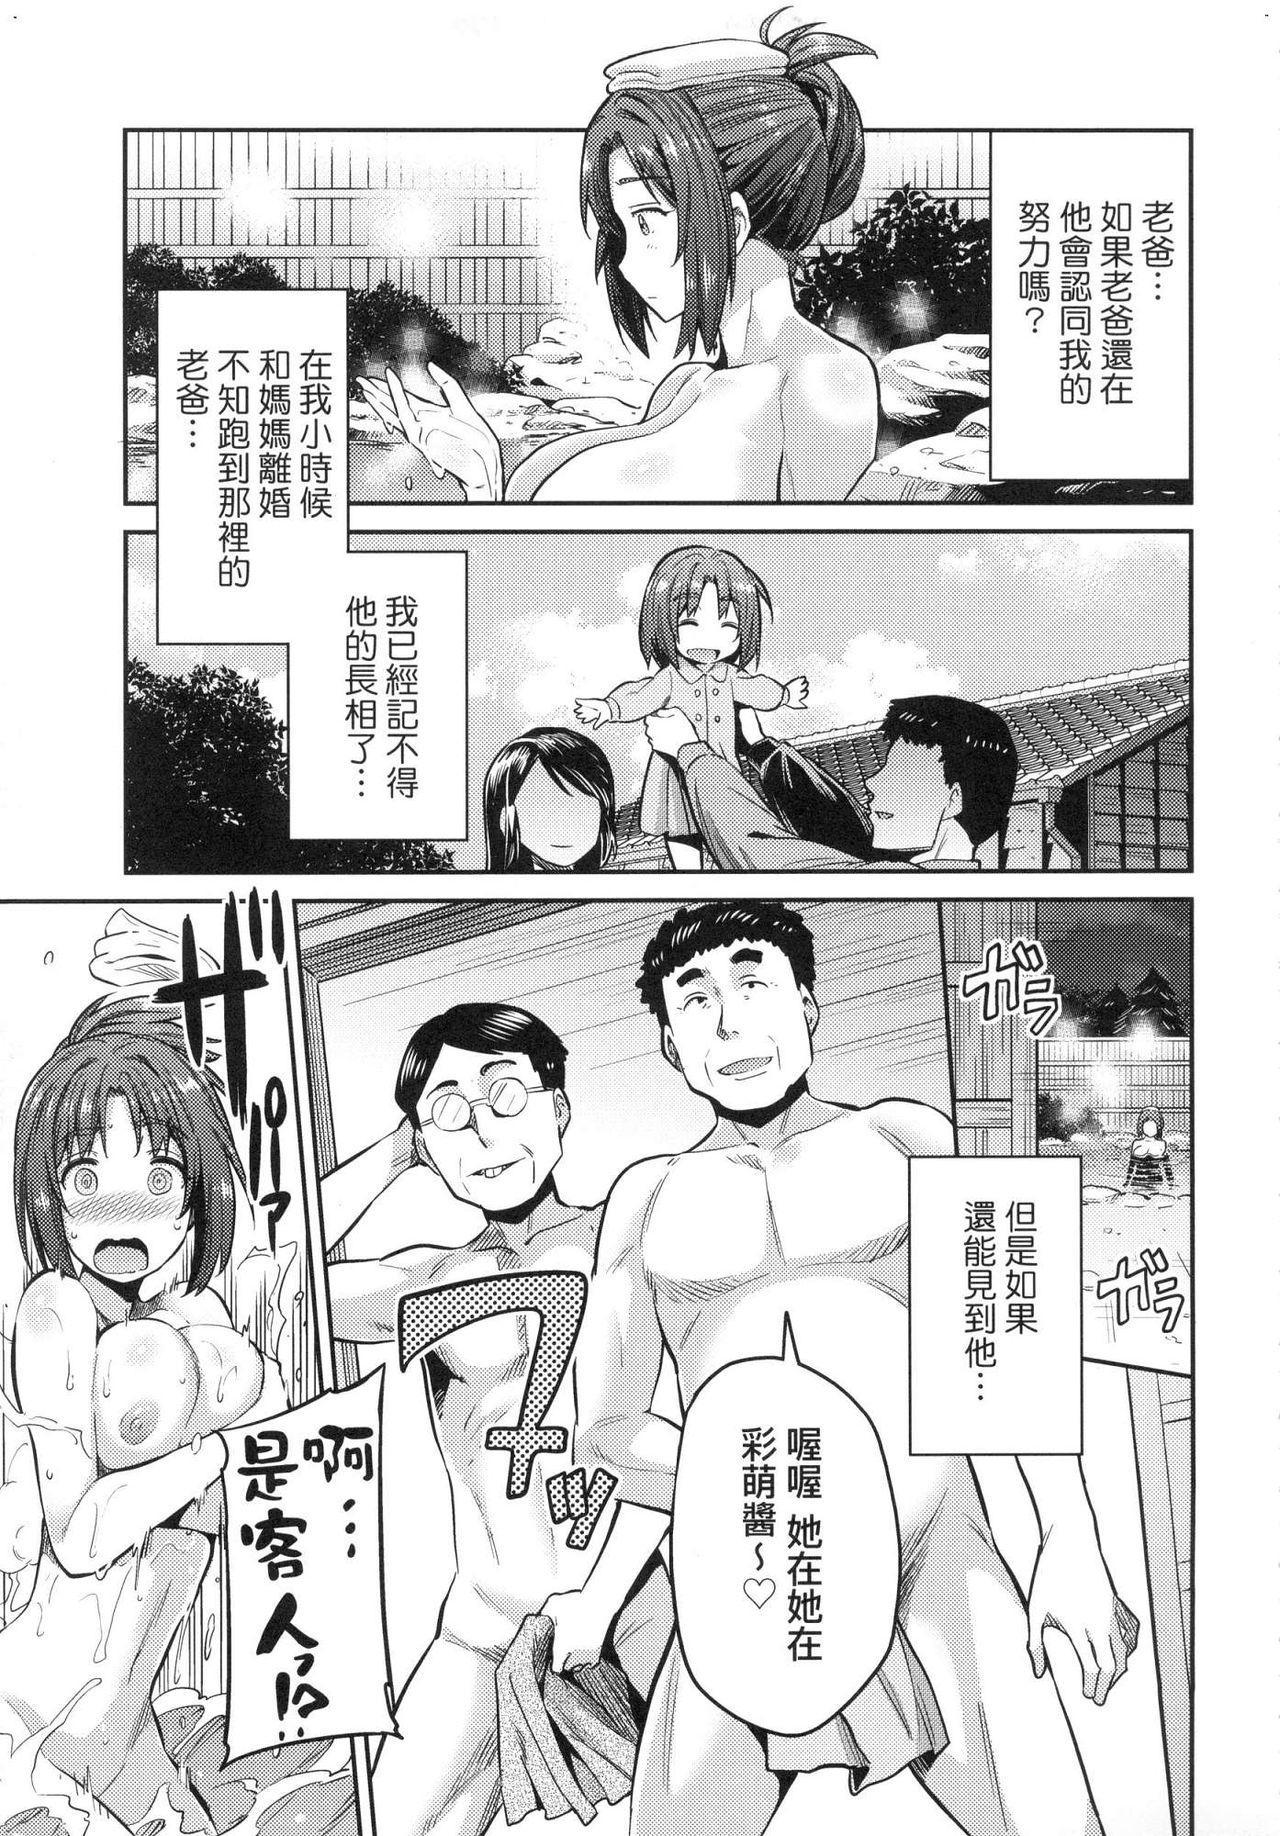 Kyousei Tanetsuke Express - Forced Seeding Express 160